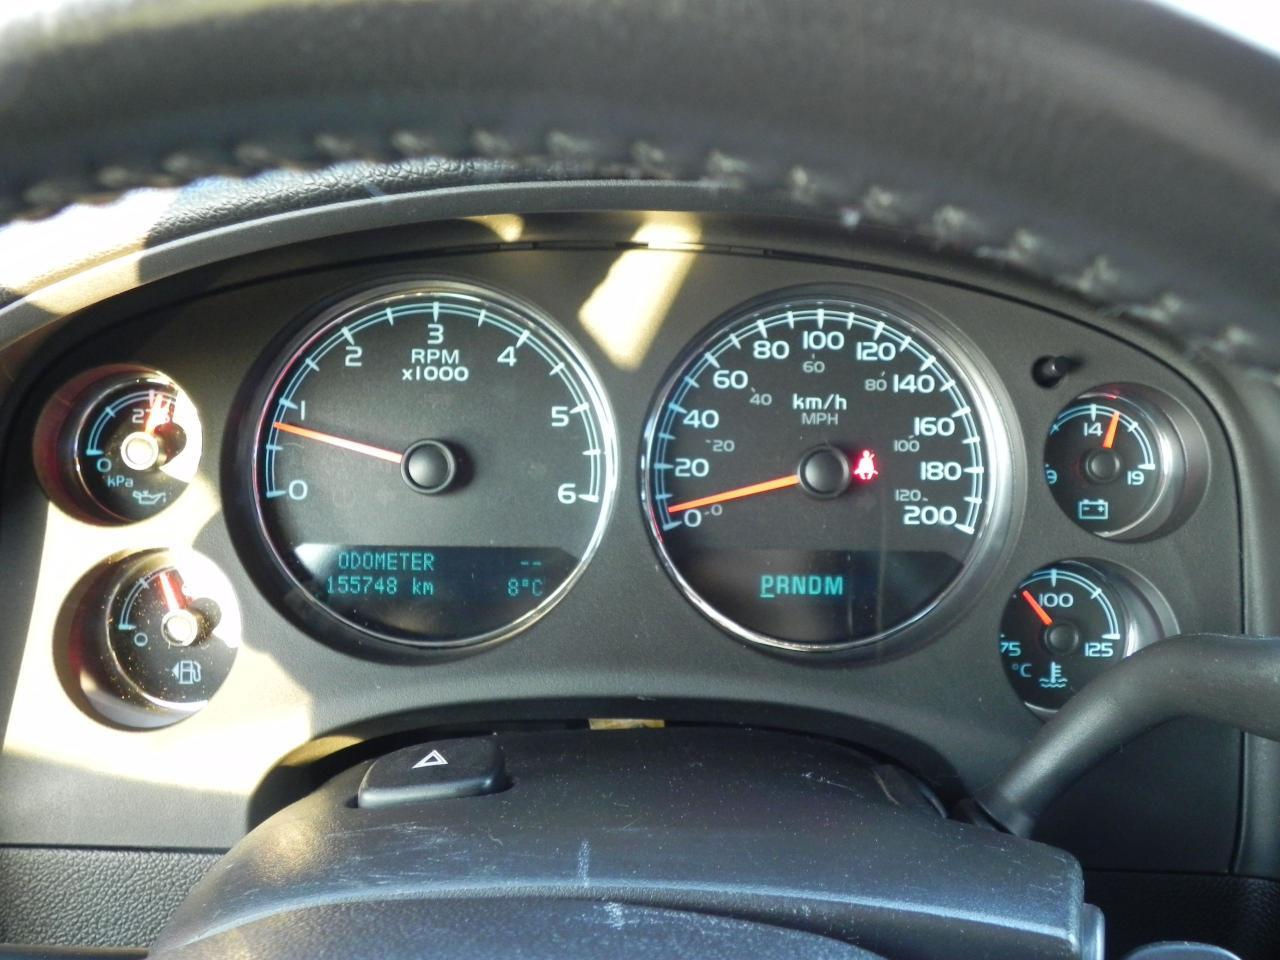 2010 Chevrolet Avalanche LTZ